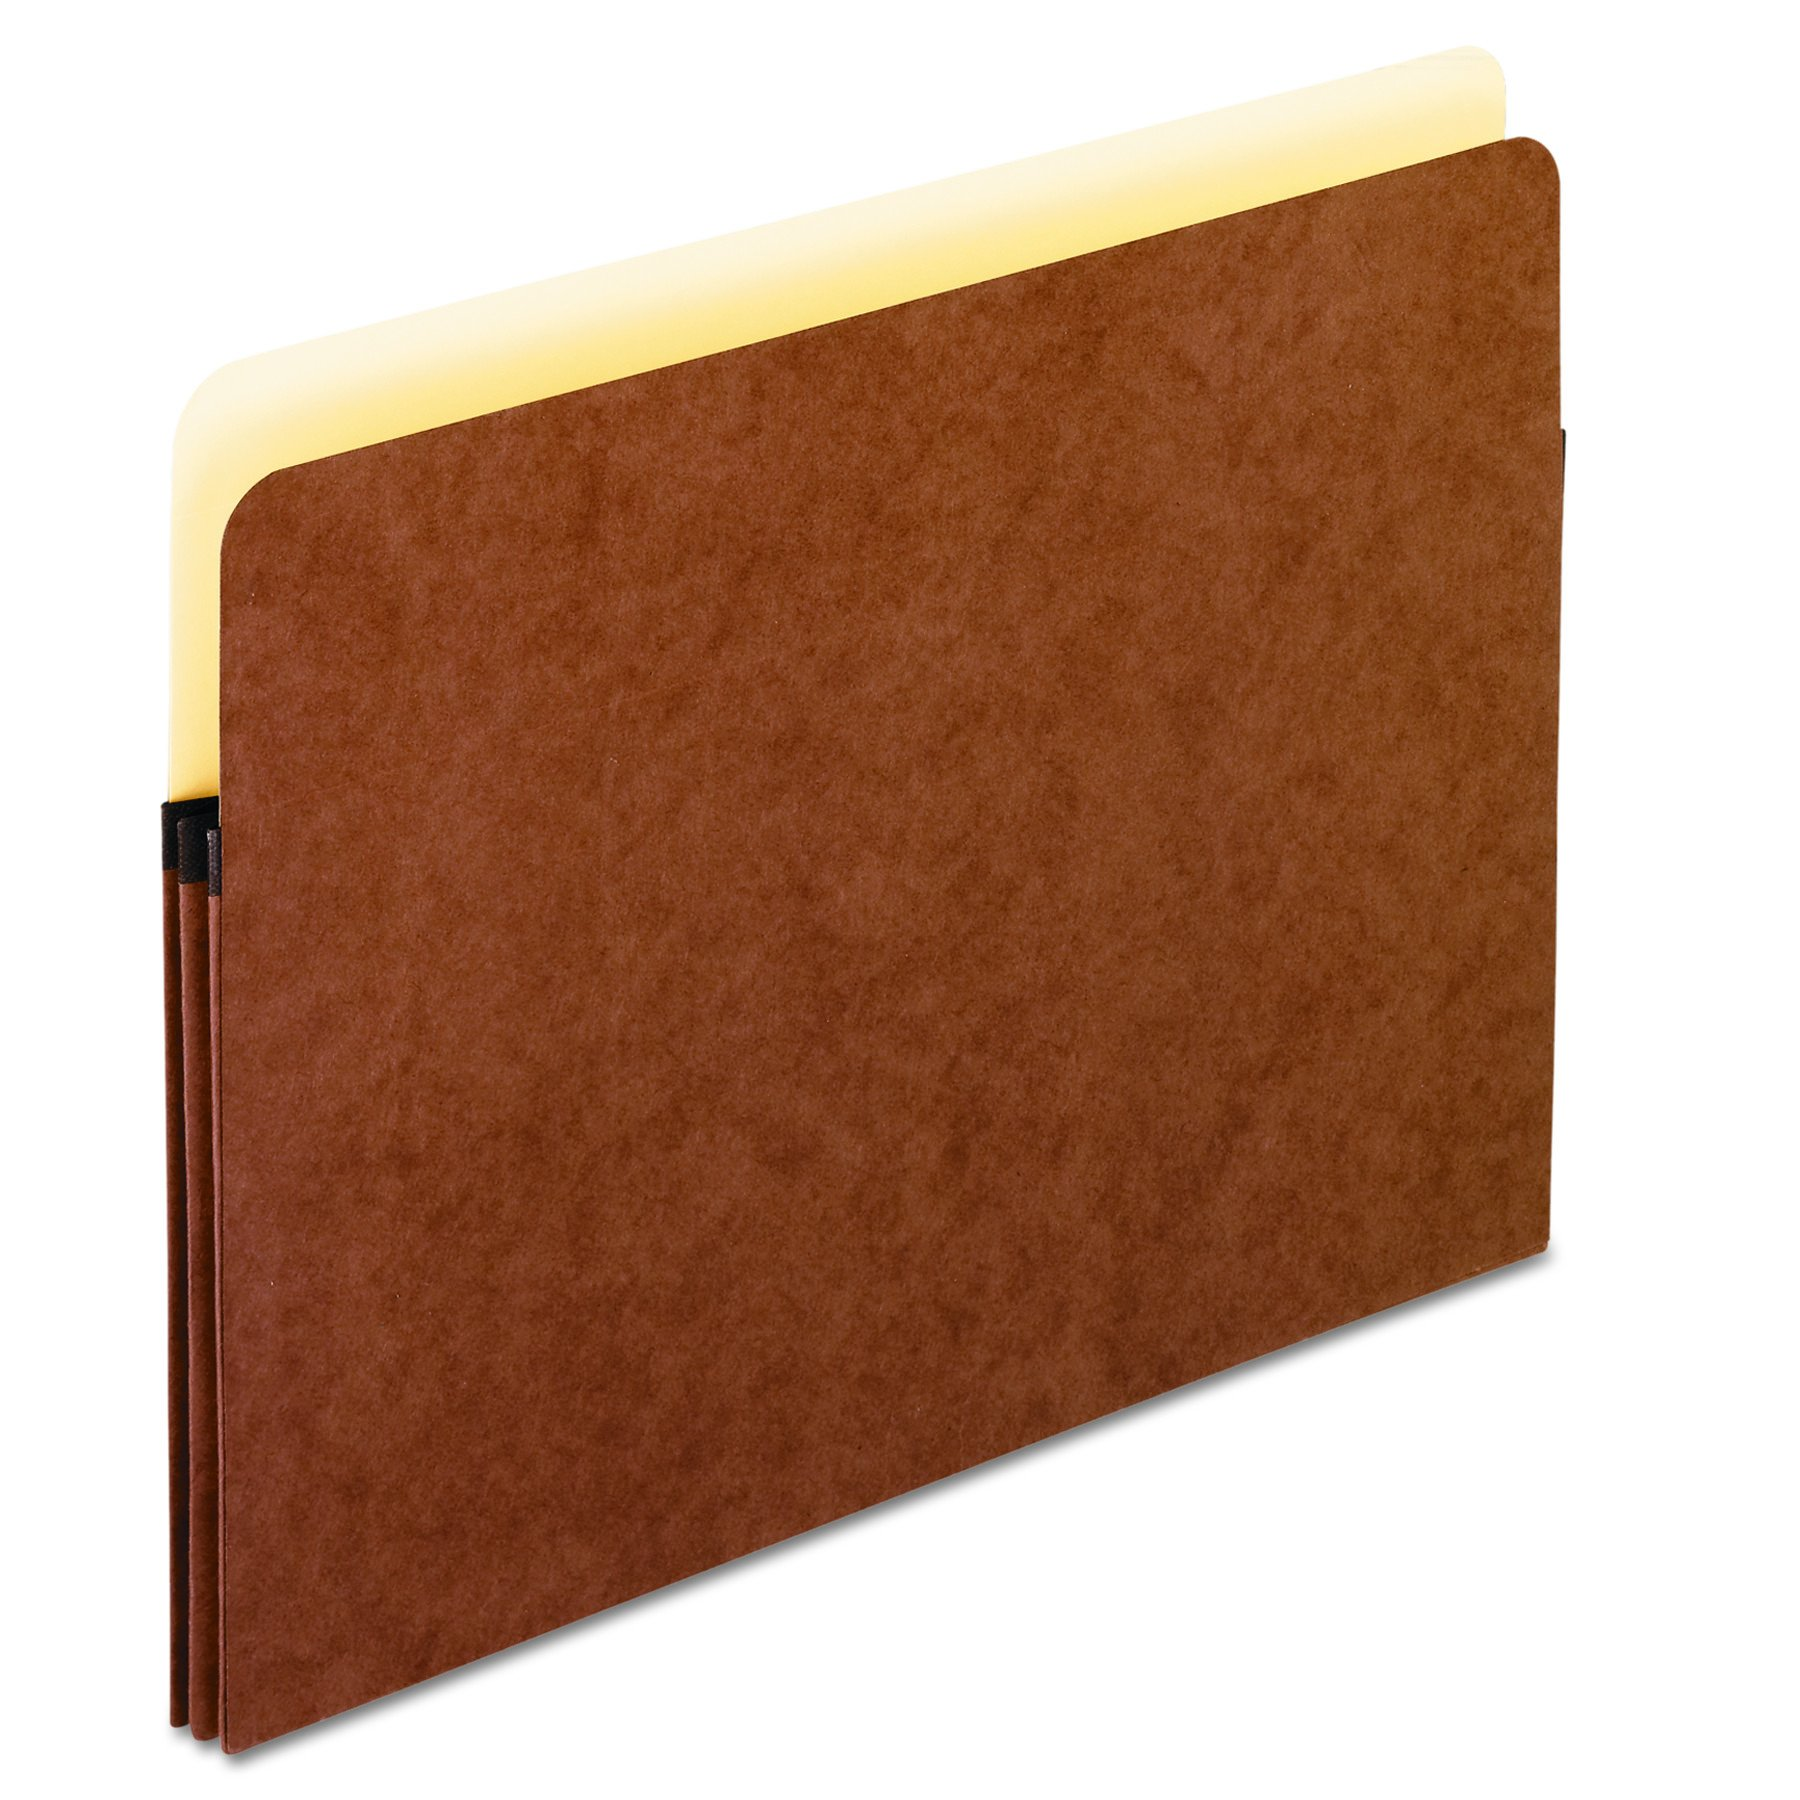 Pendaflex File Pockets, 1.75 Inch Expansion, Brown, Letter, 25 per box (1514C-OX)